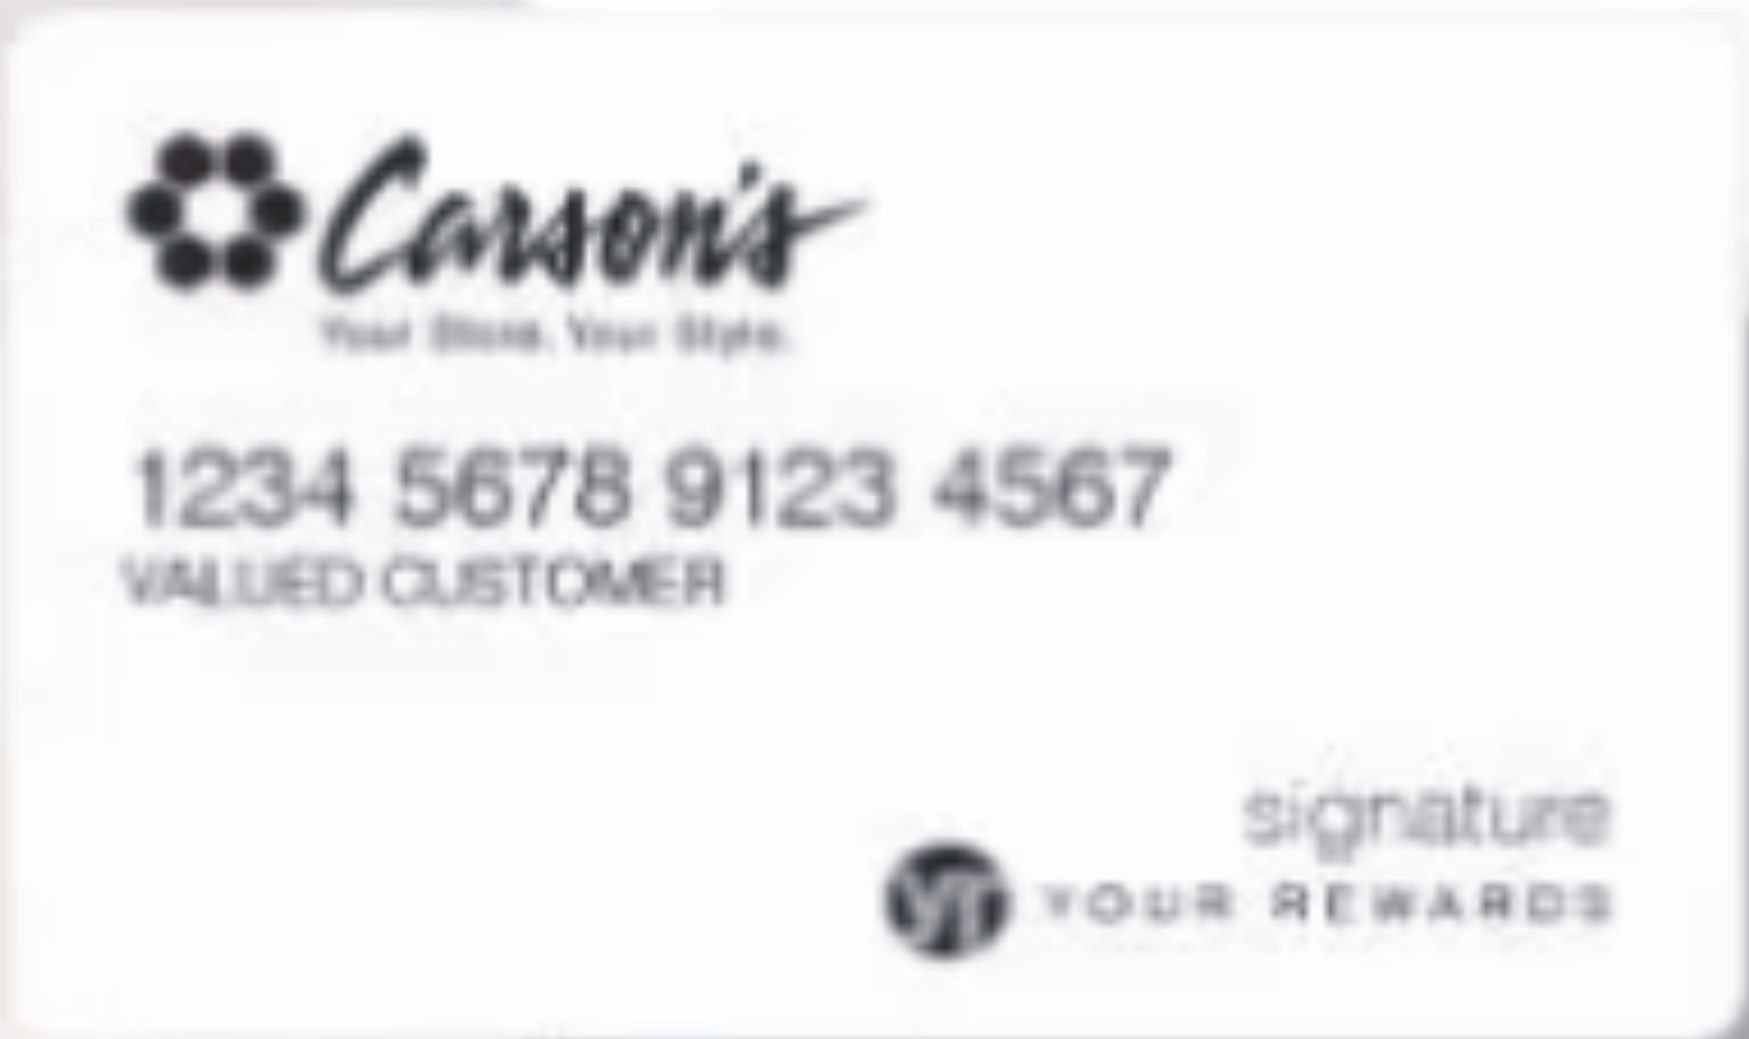 Carson+Pirie+Scott+Rewards+Credit+Card+Application